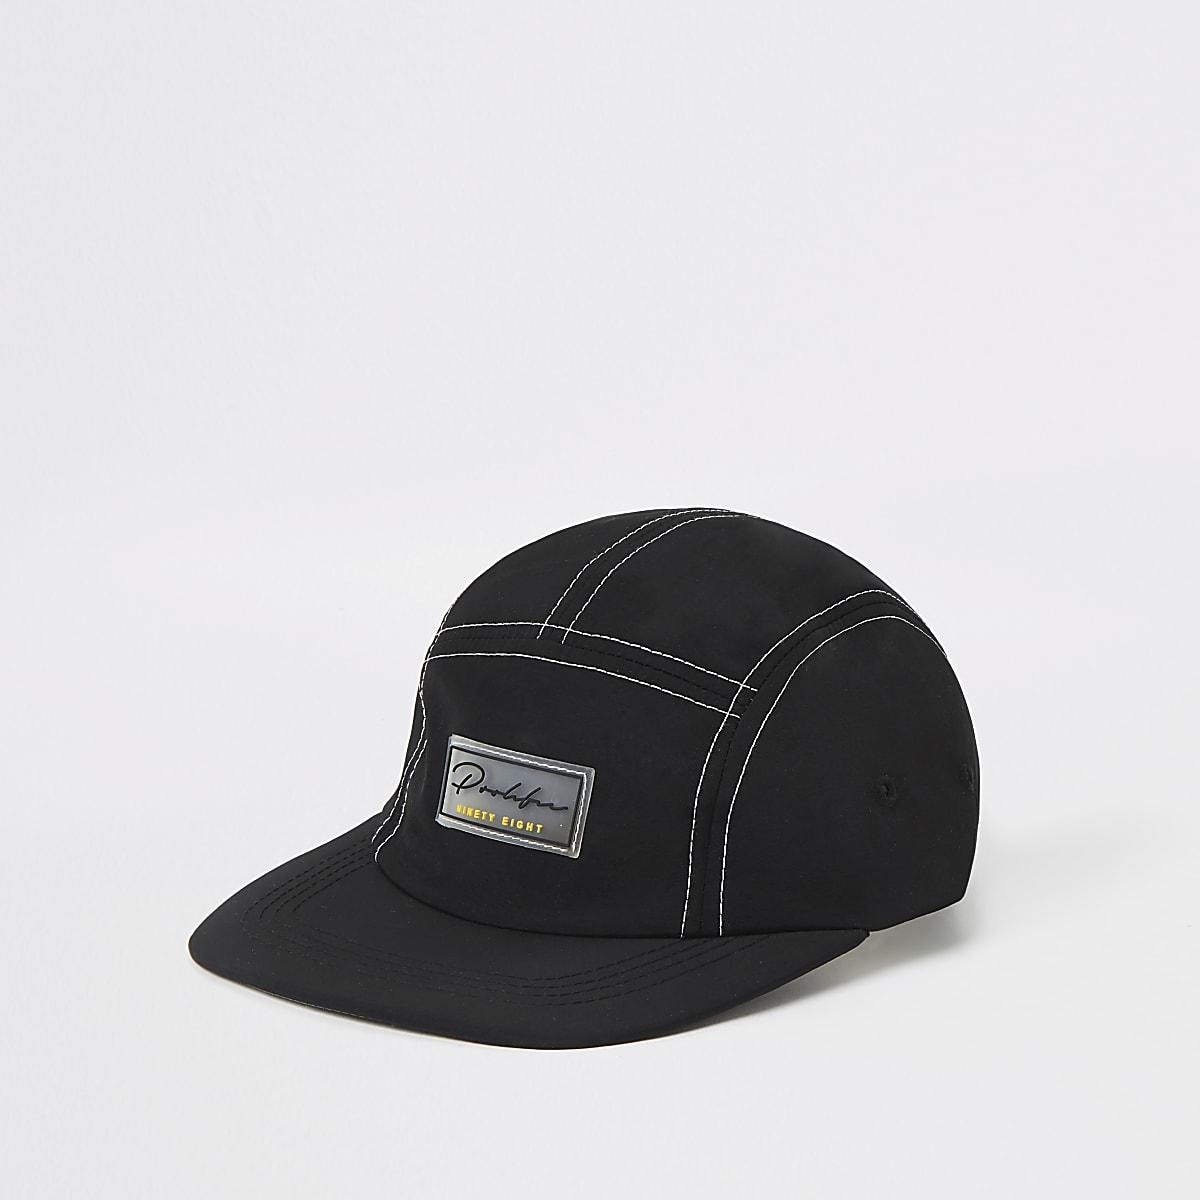 Black Prolific 5 panel cap